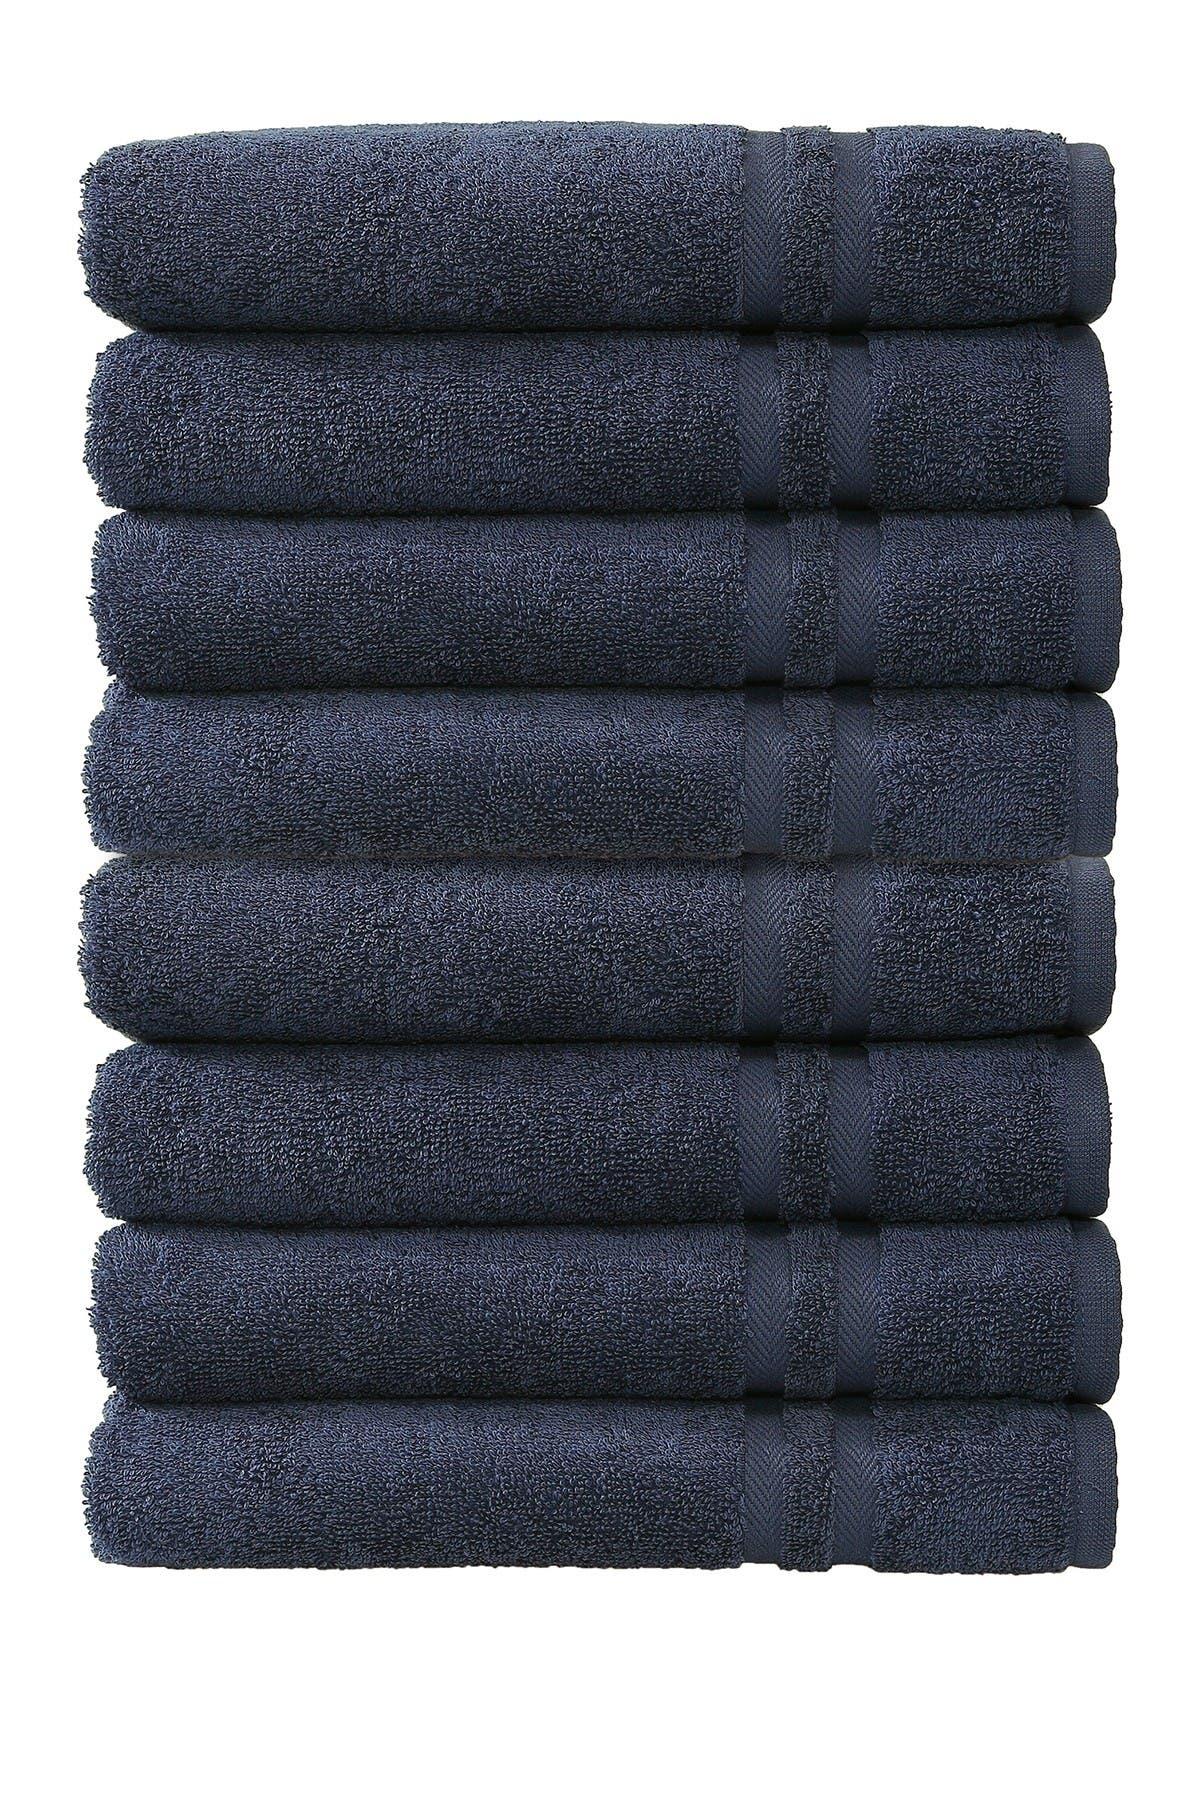 Image of LINUM HOME Denzi Hand Towels - Set of 8 - Twilight Blue